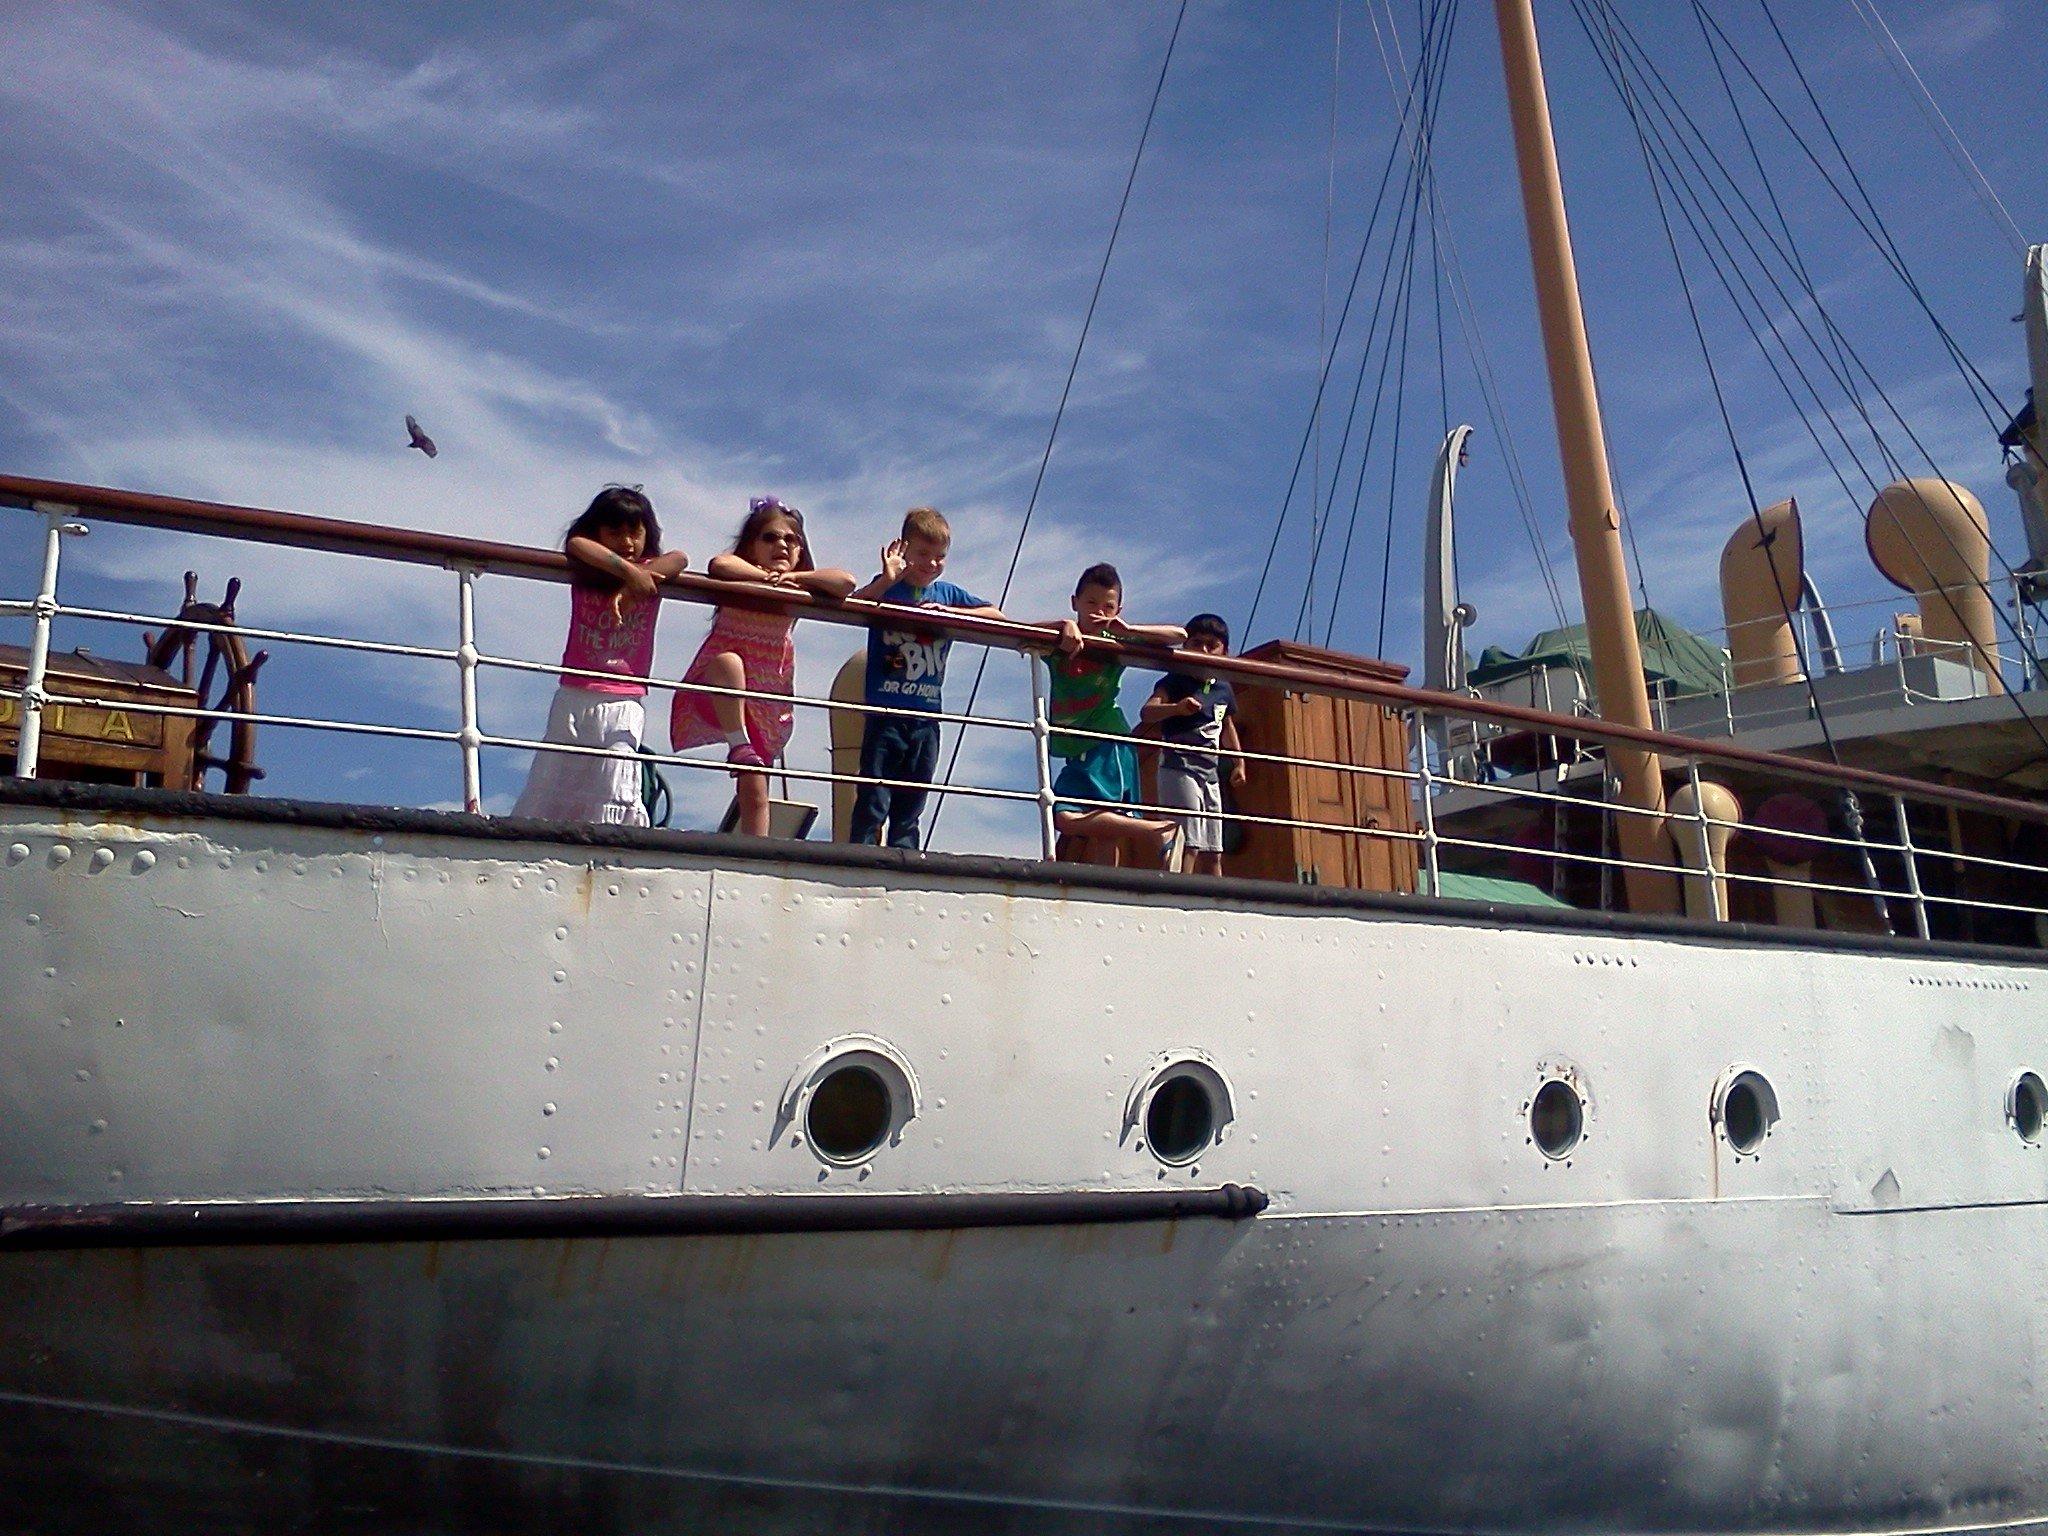 Halifax-Learning-Summer-Camp-Boat-1